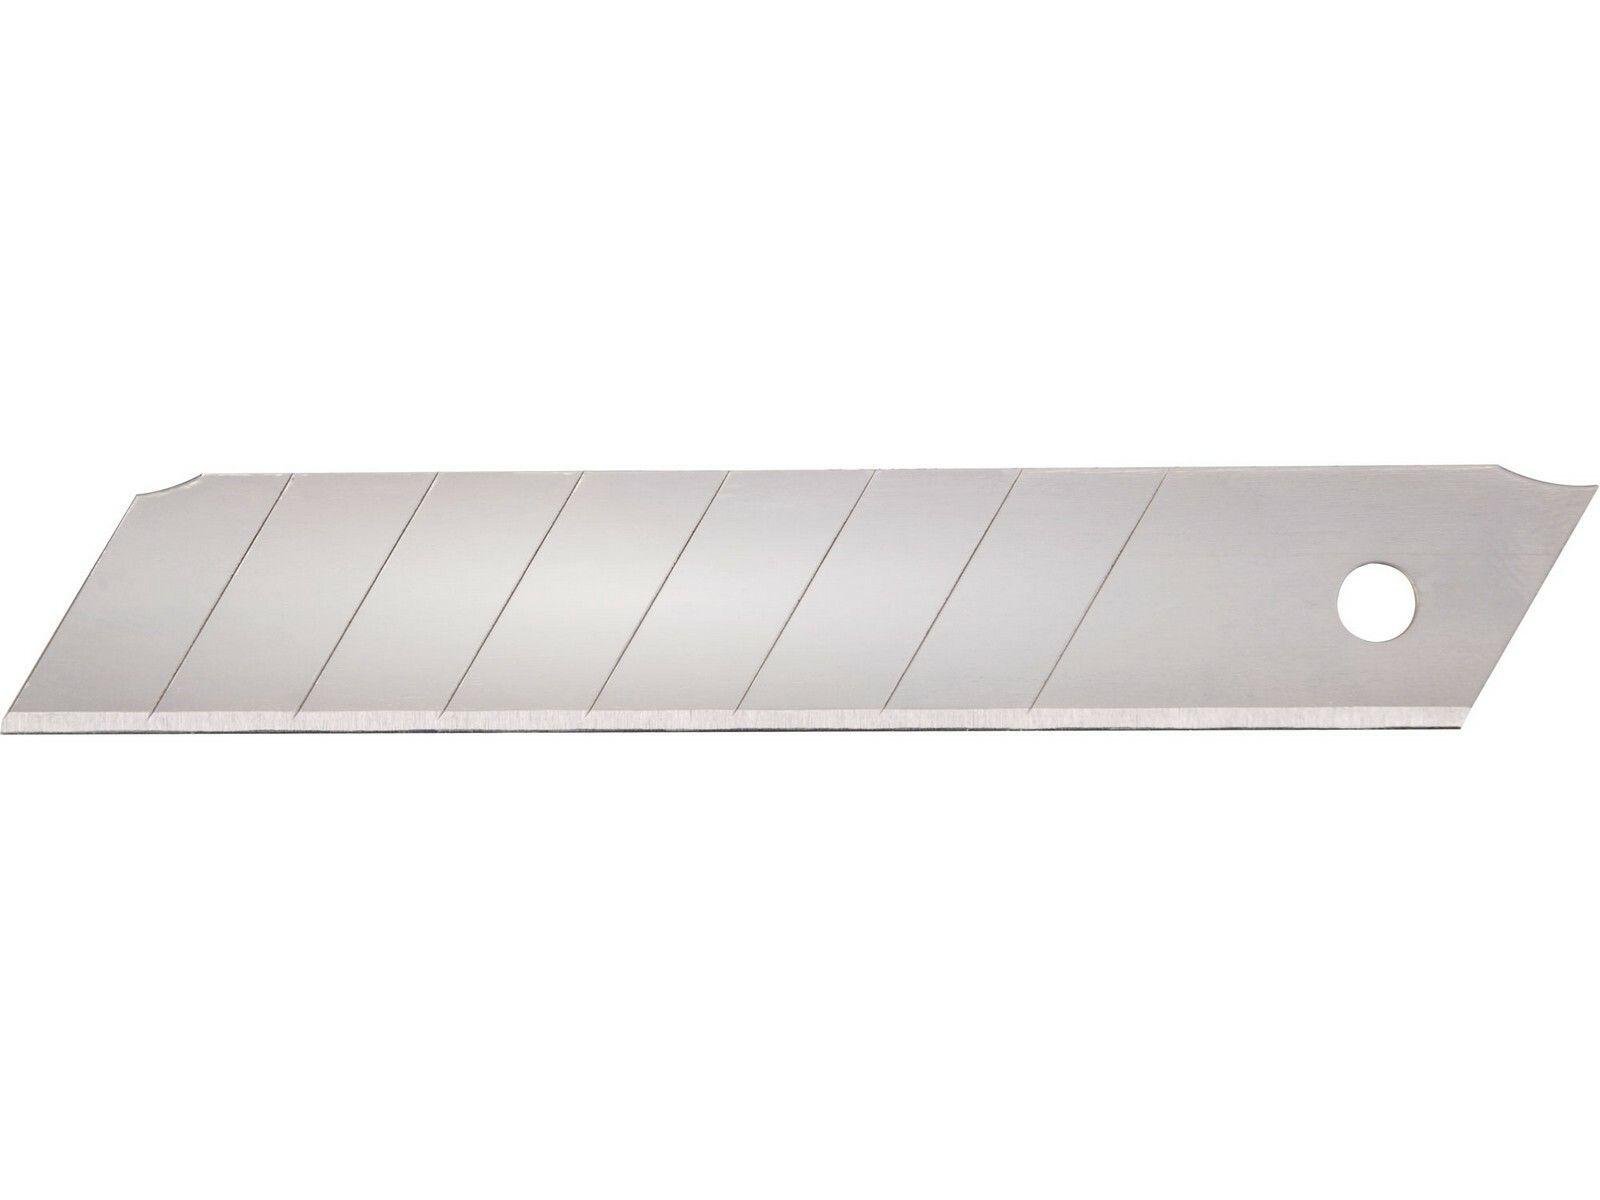 Břity ulamovací do nože, 18mm, 10ks, SK4 EXTOL-PREMIUM